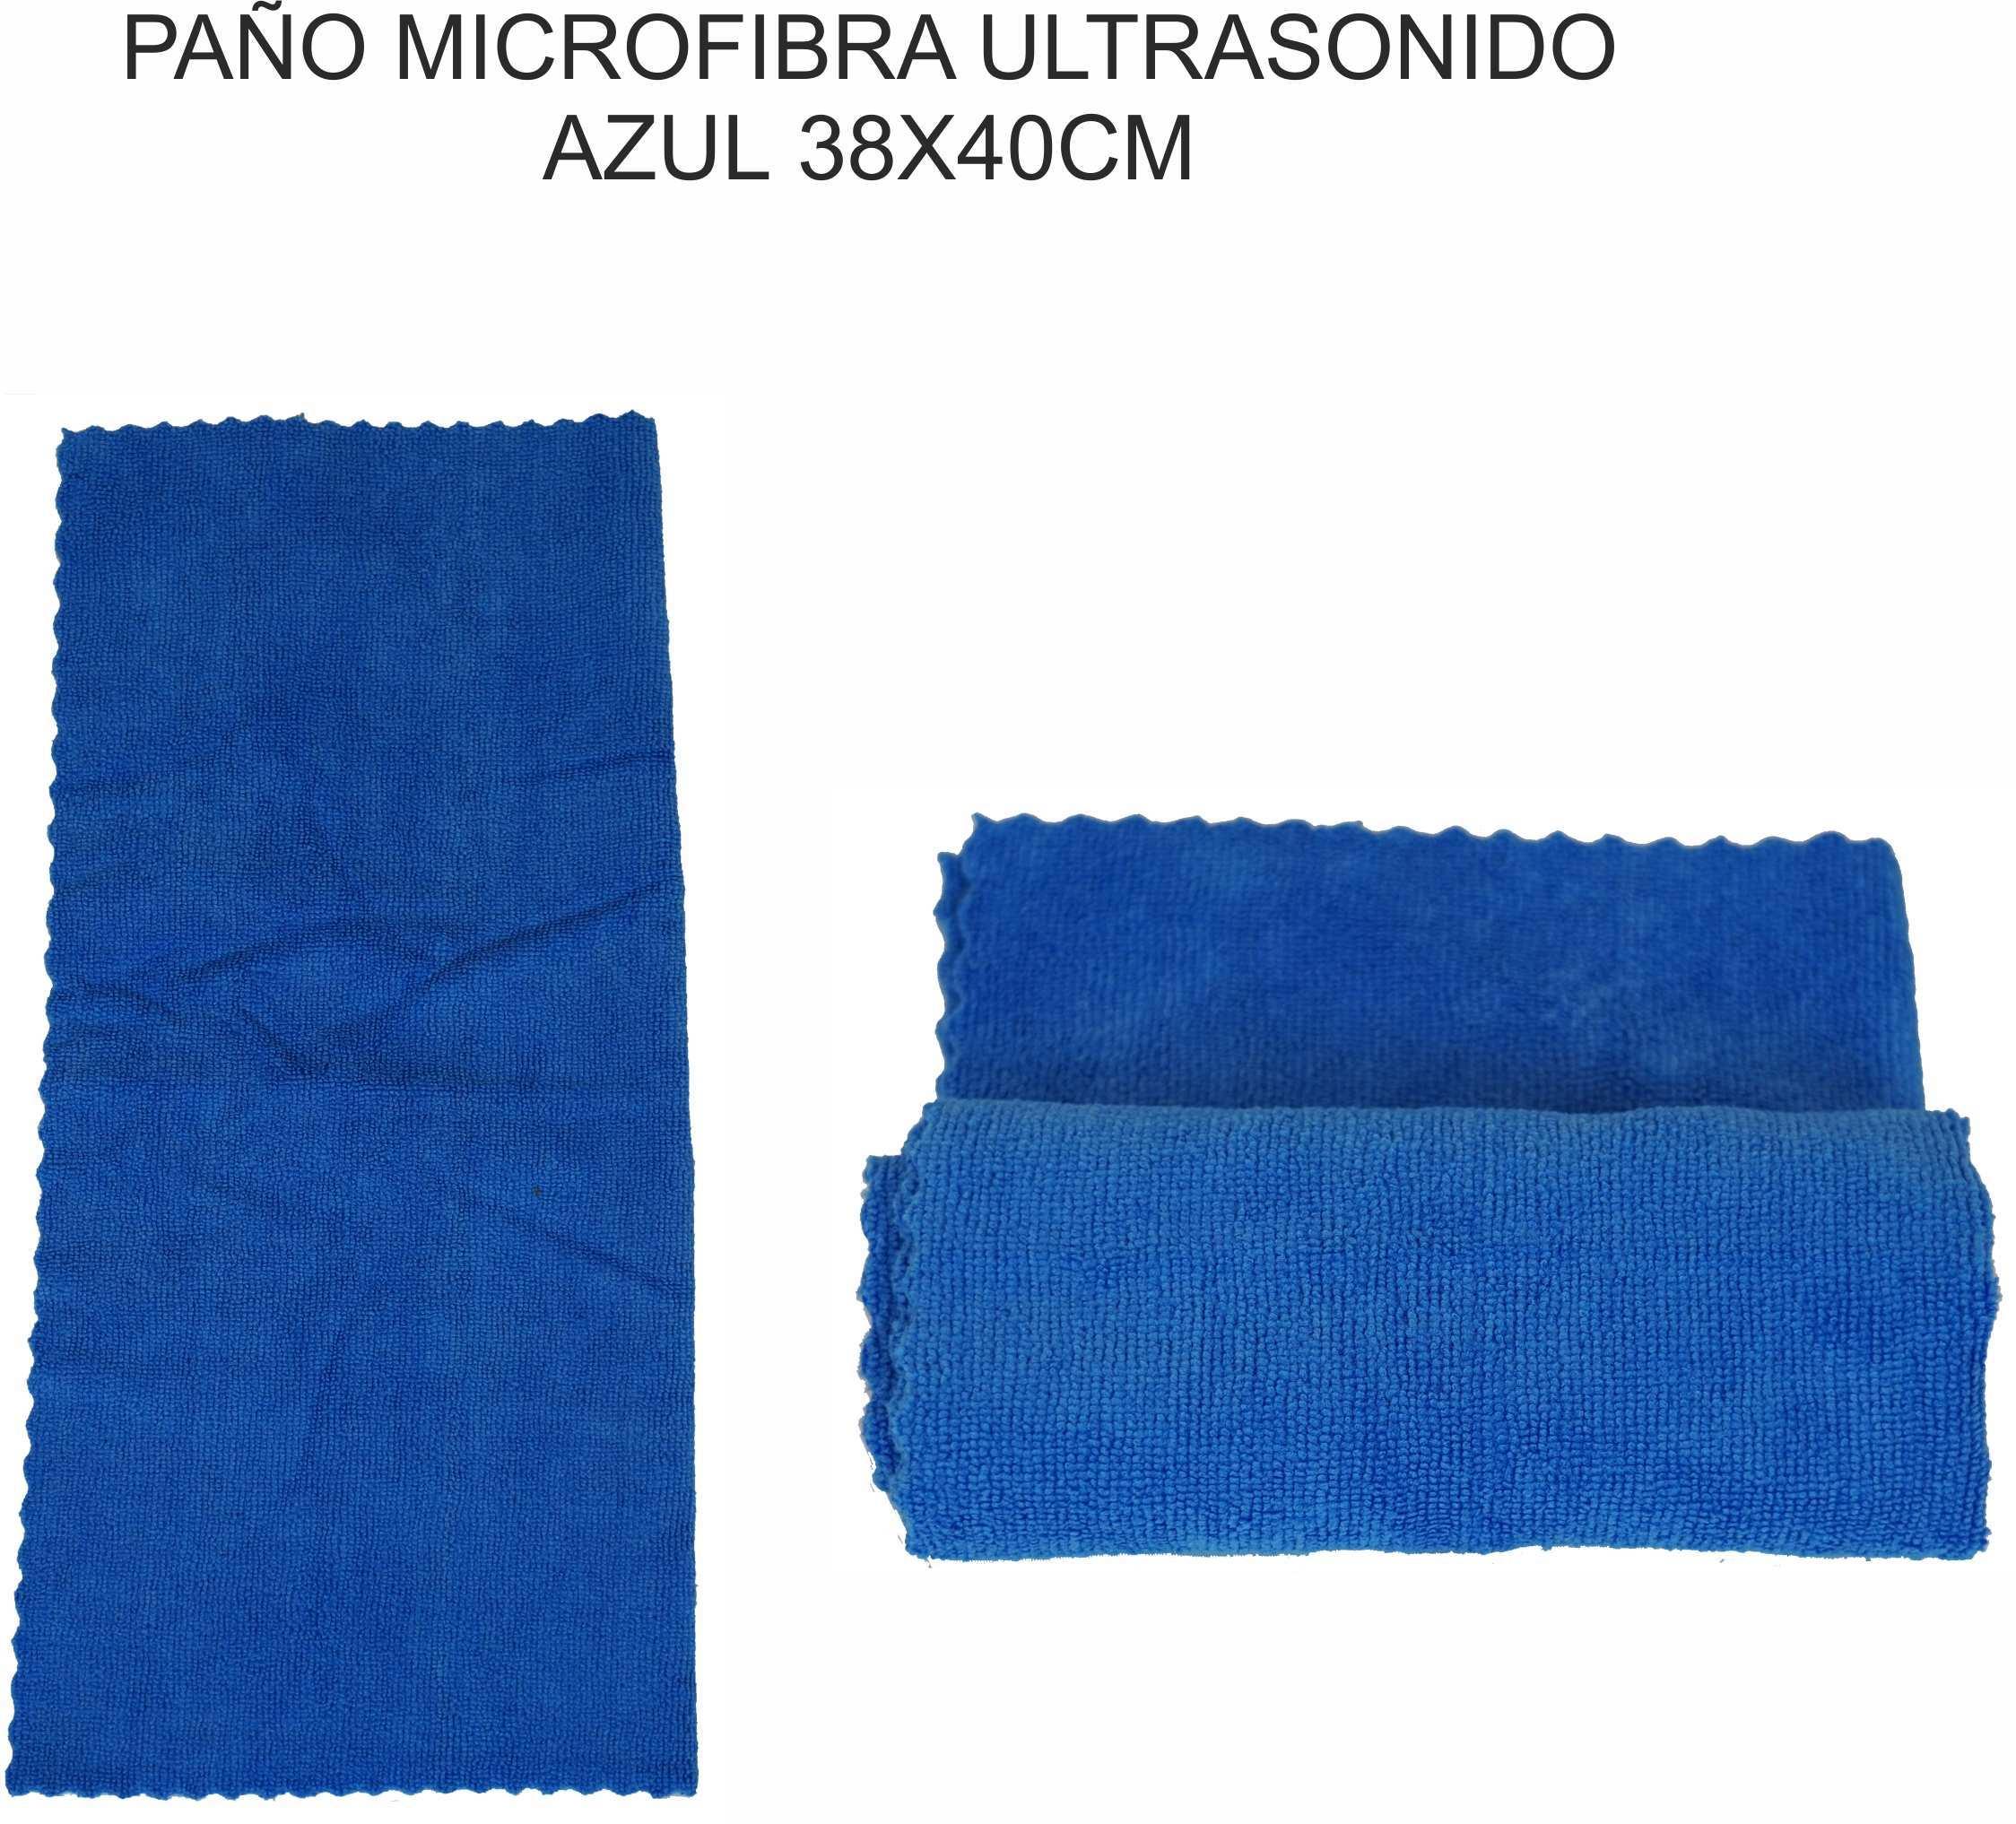 PAÑO MICROFIBRA ULTRASONIDO AZUL 38X40CM PAMEX